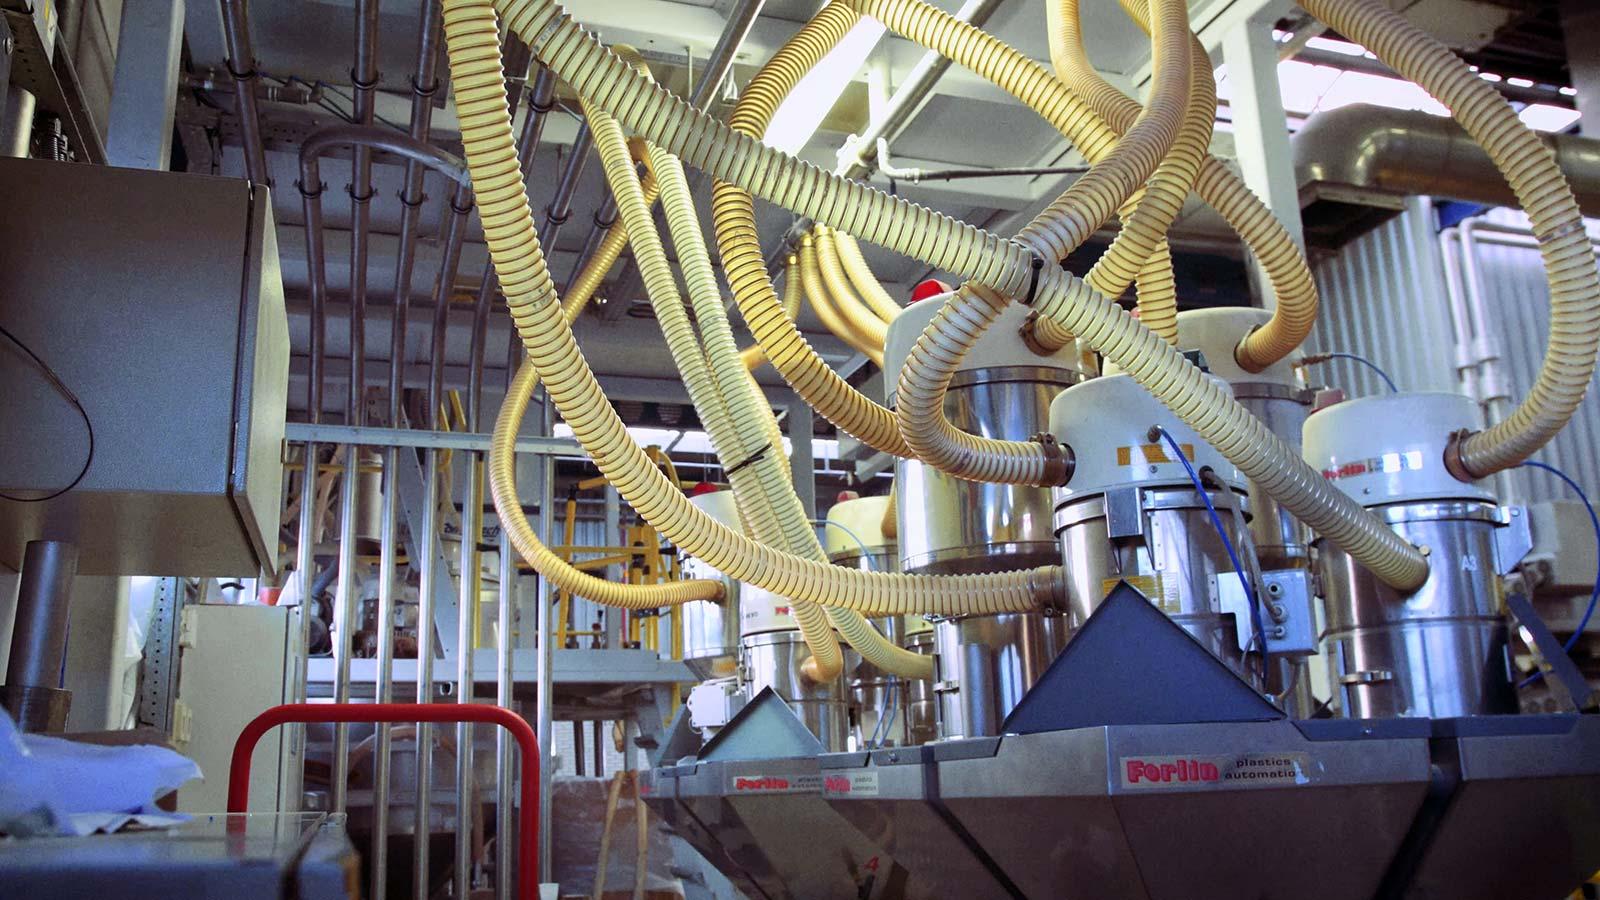 proces-industrie-technische-fabriek-films